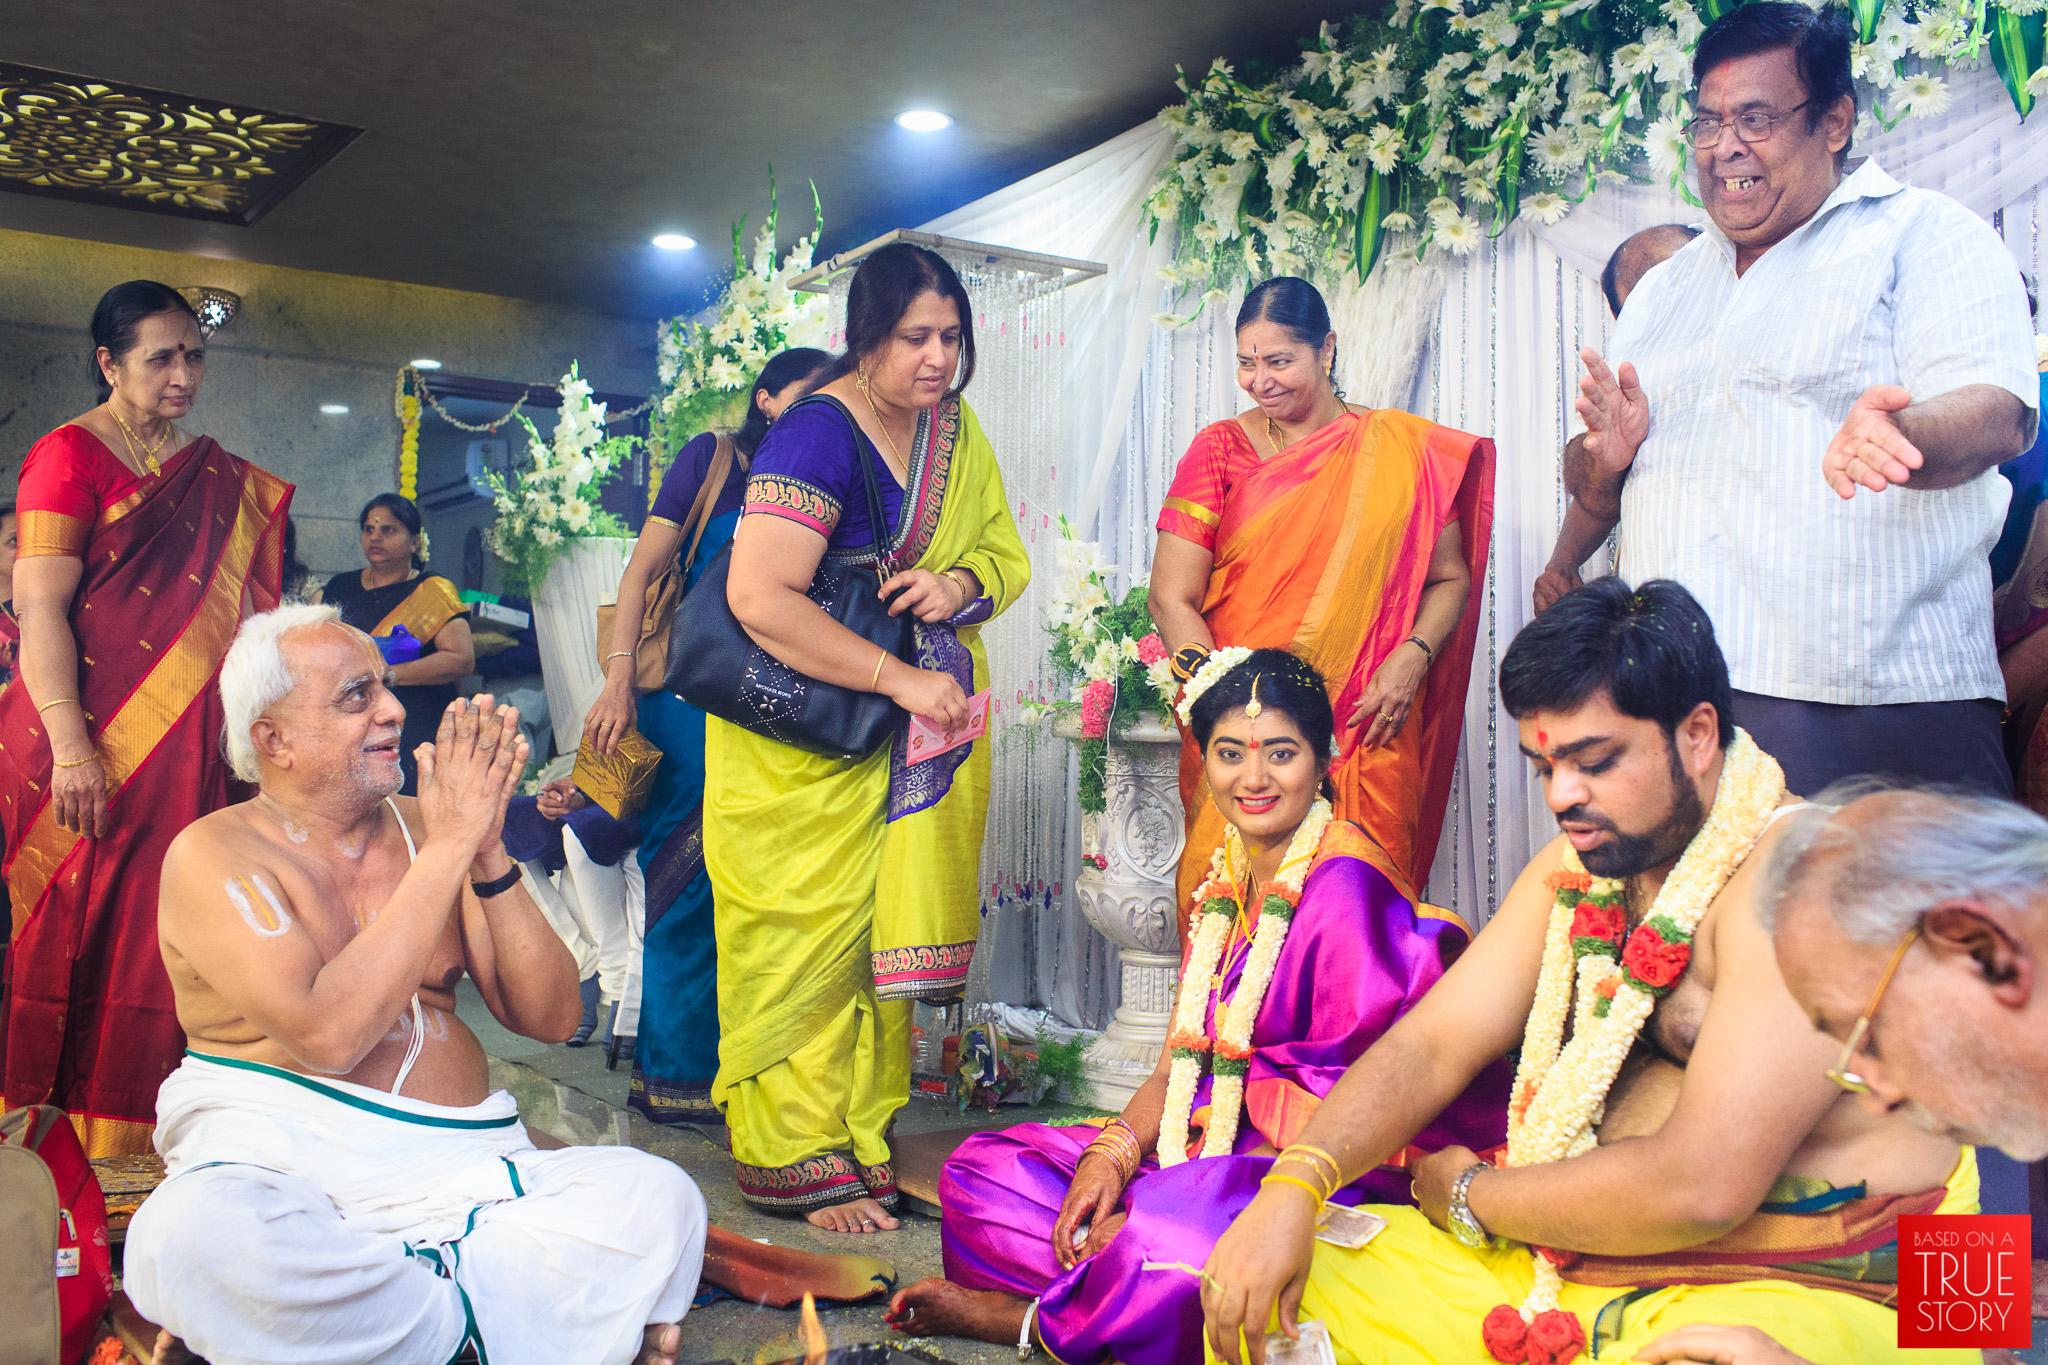 Tambrahm-Candid-Wedding-Photographers-Bangalore-0092.jpg